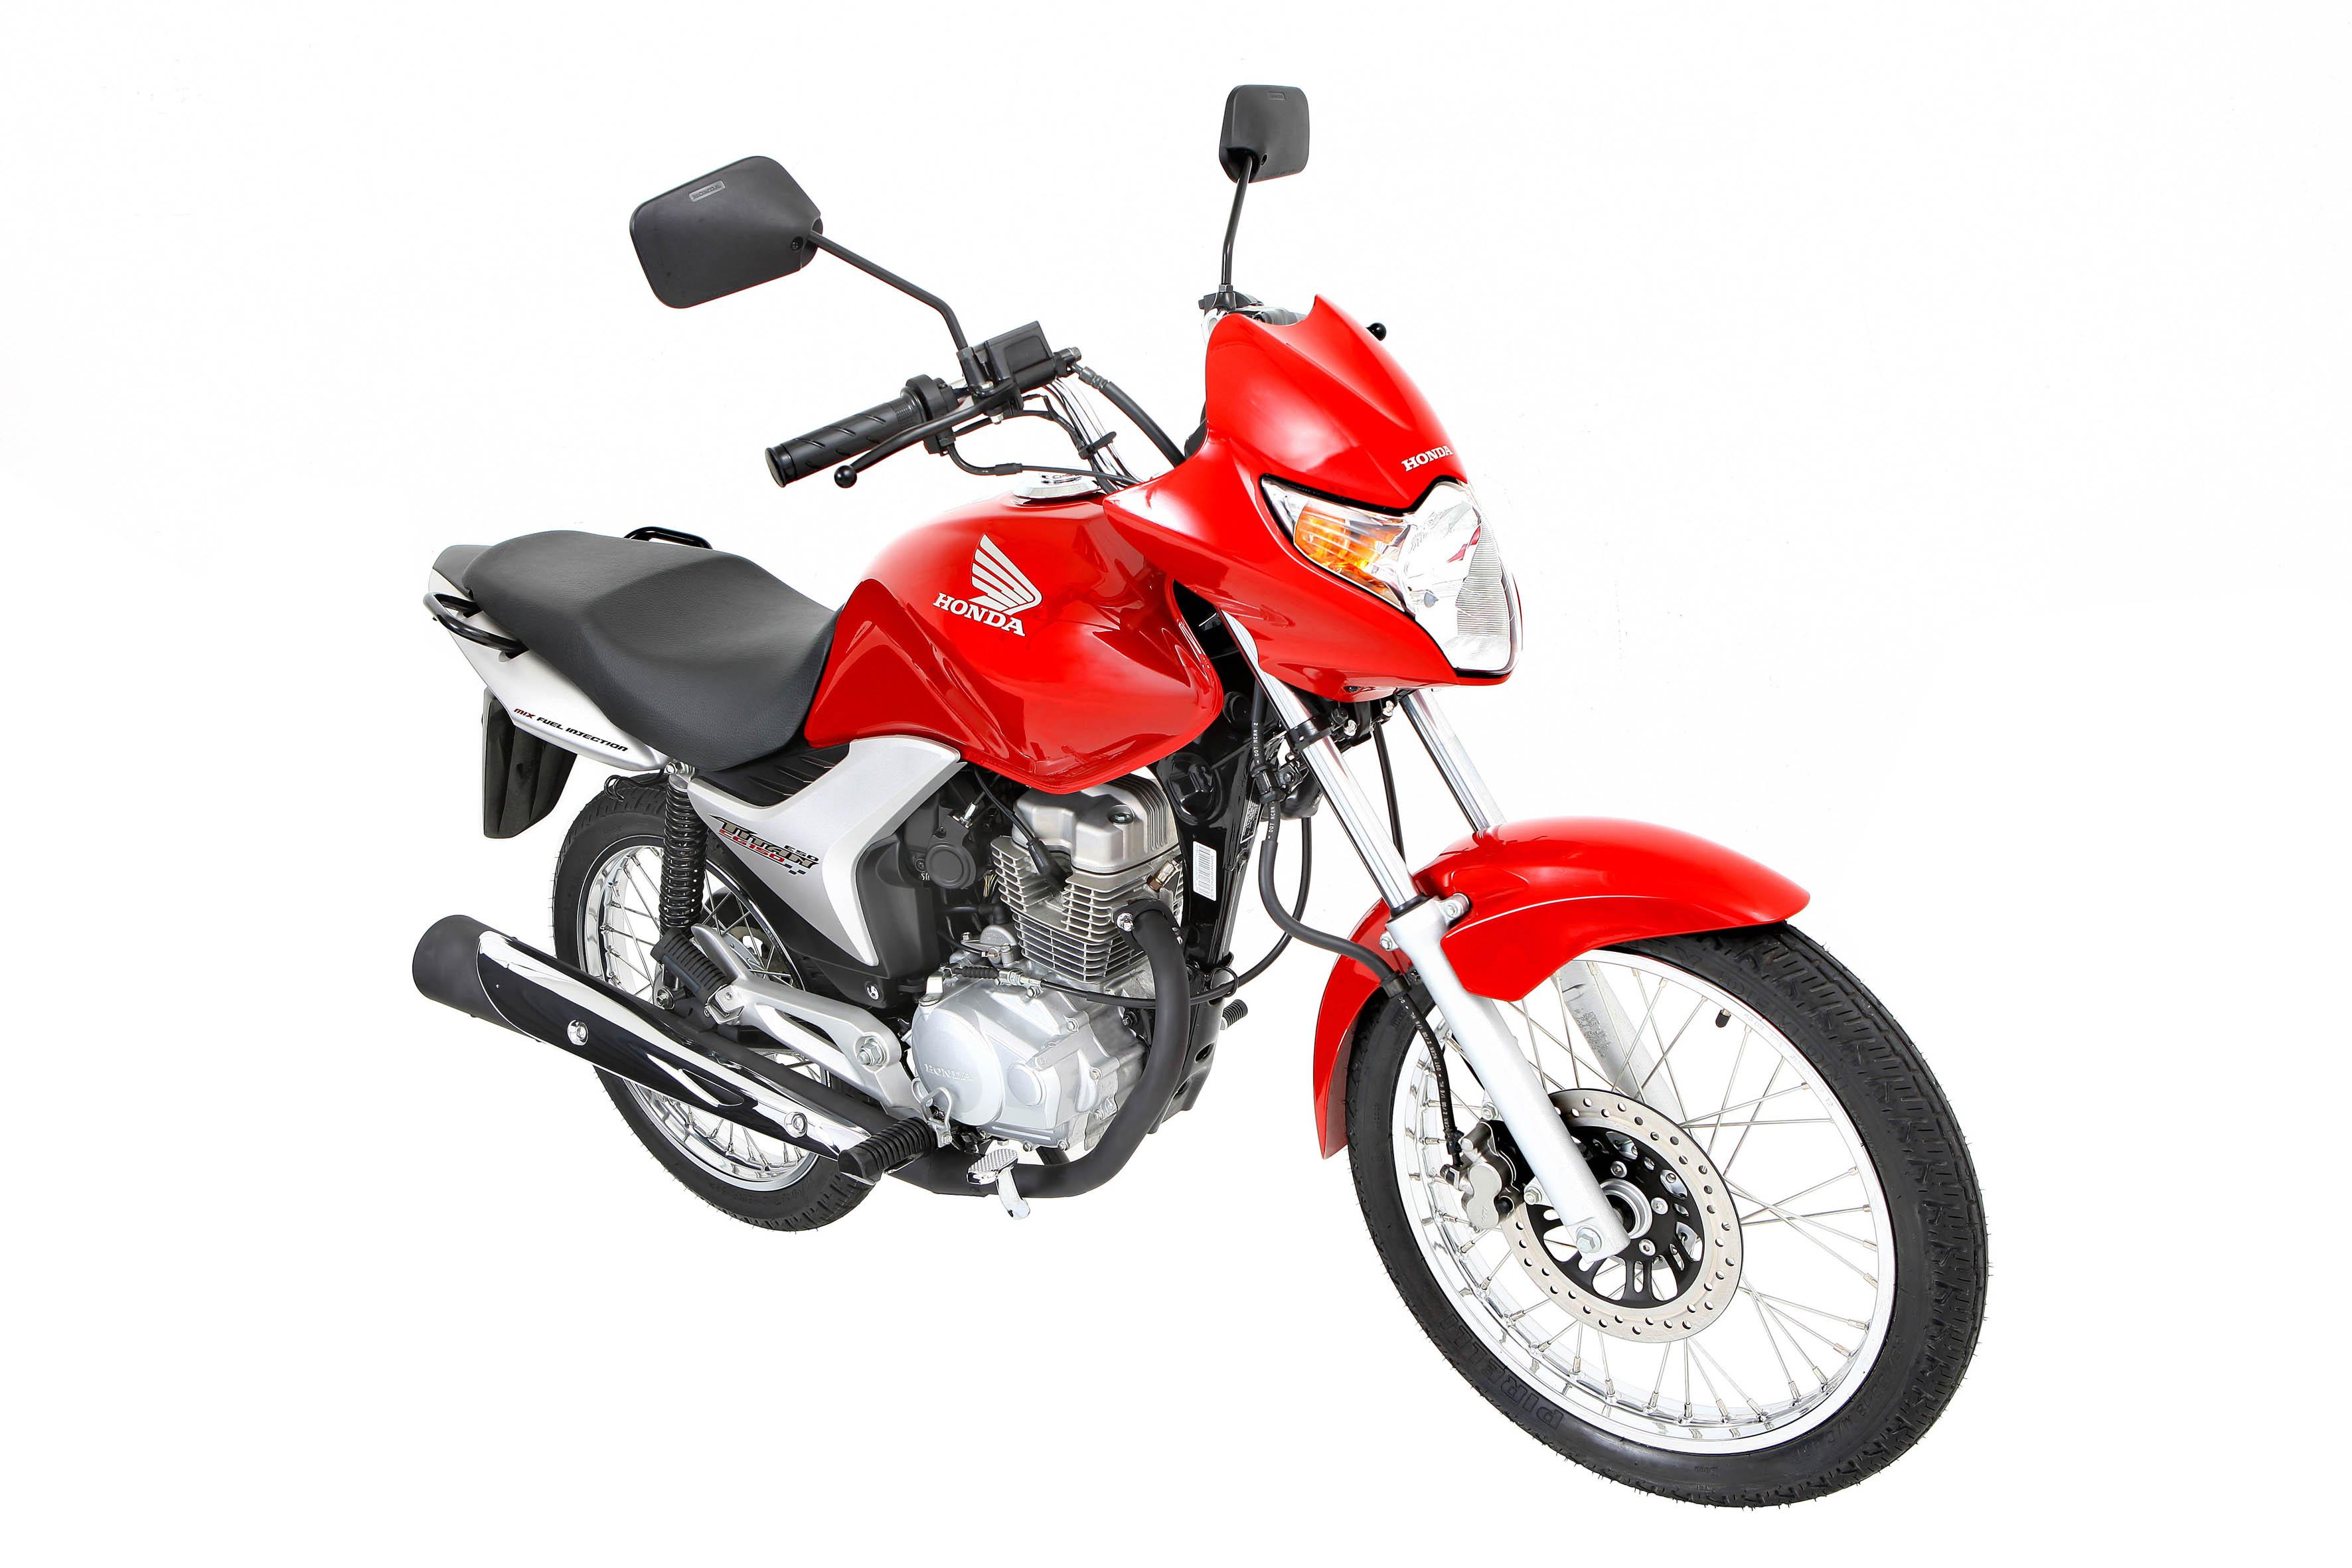 foto modelo moto: